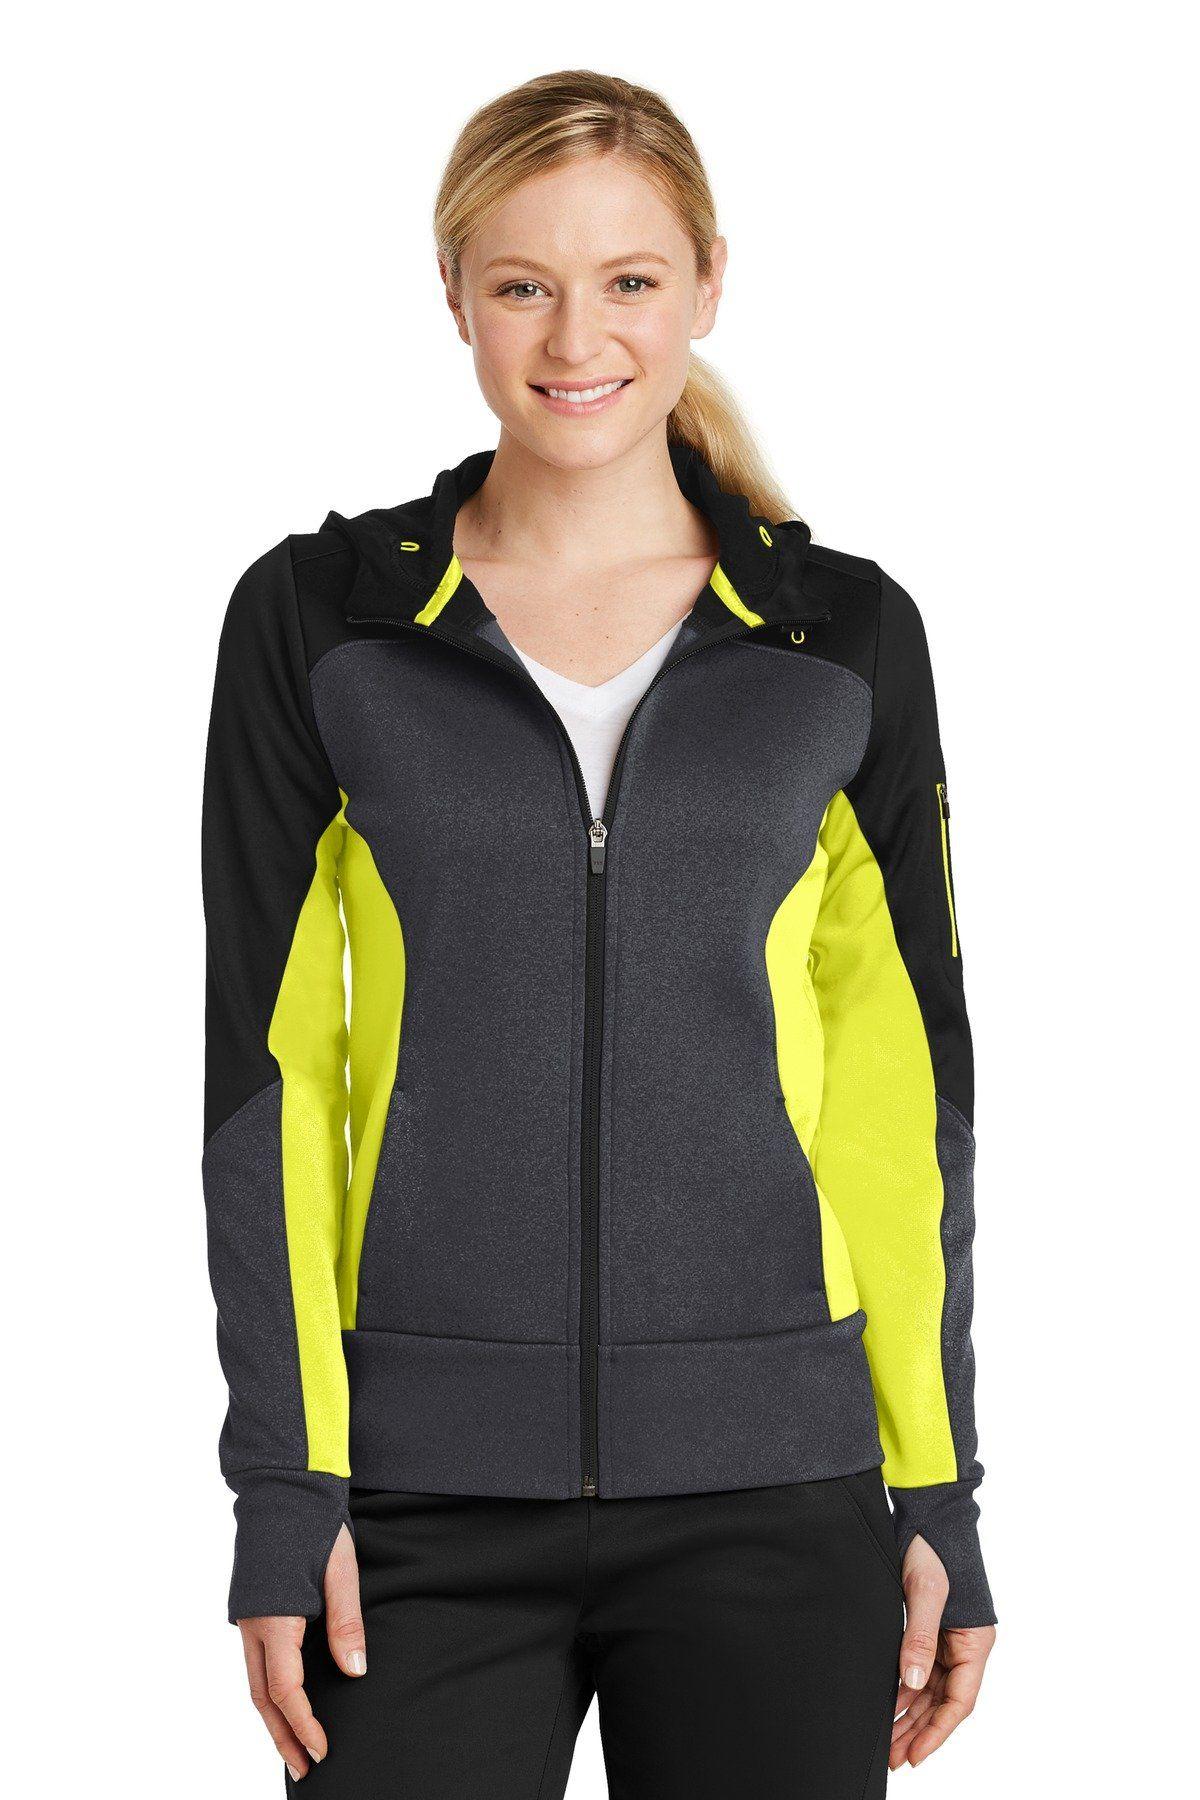 SportTek Ladies Tech Fleece Colorblock FullZip Hooded